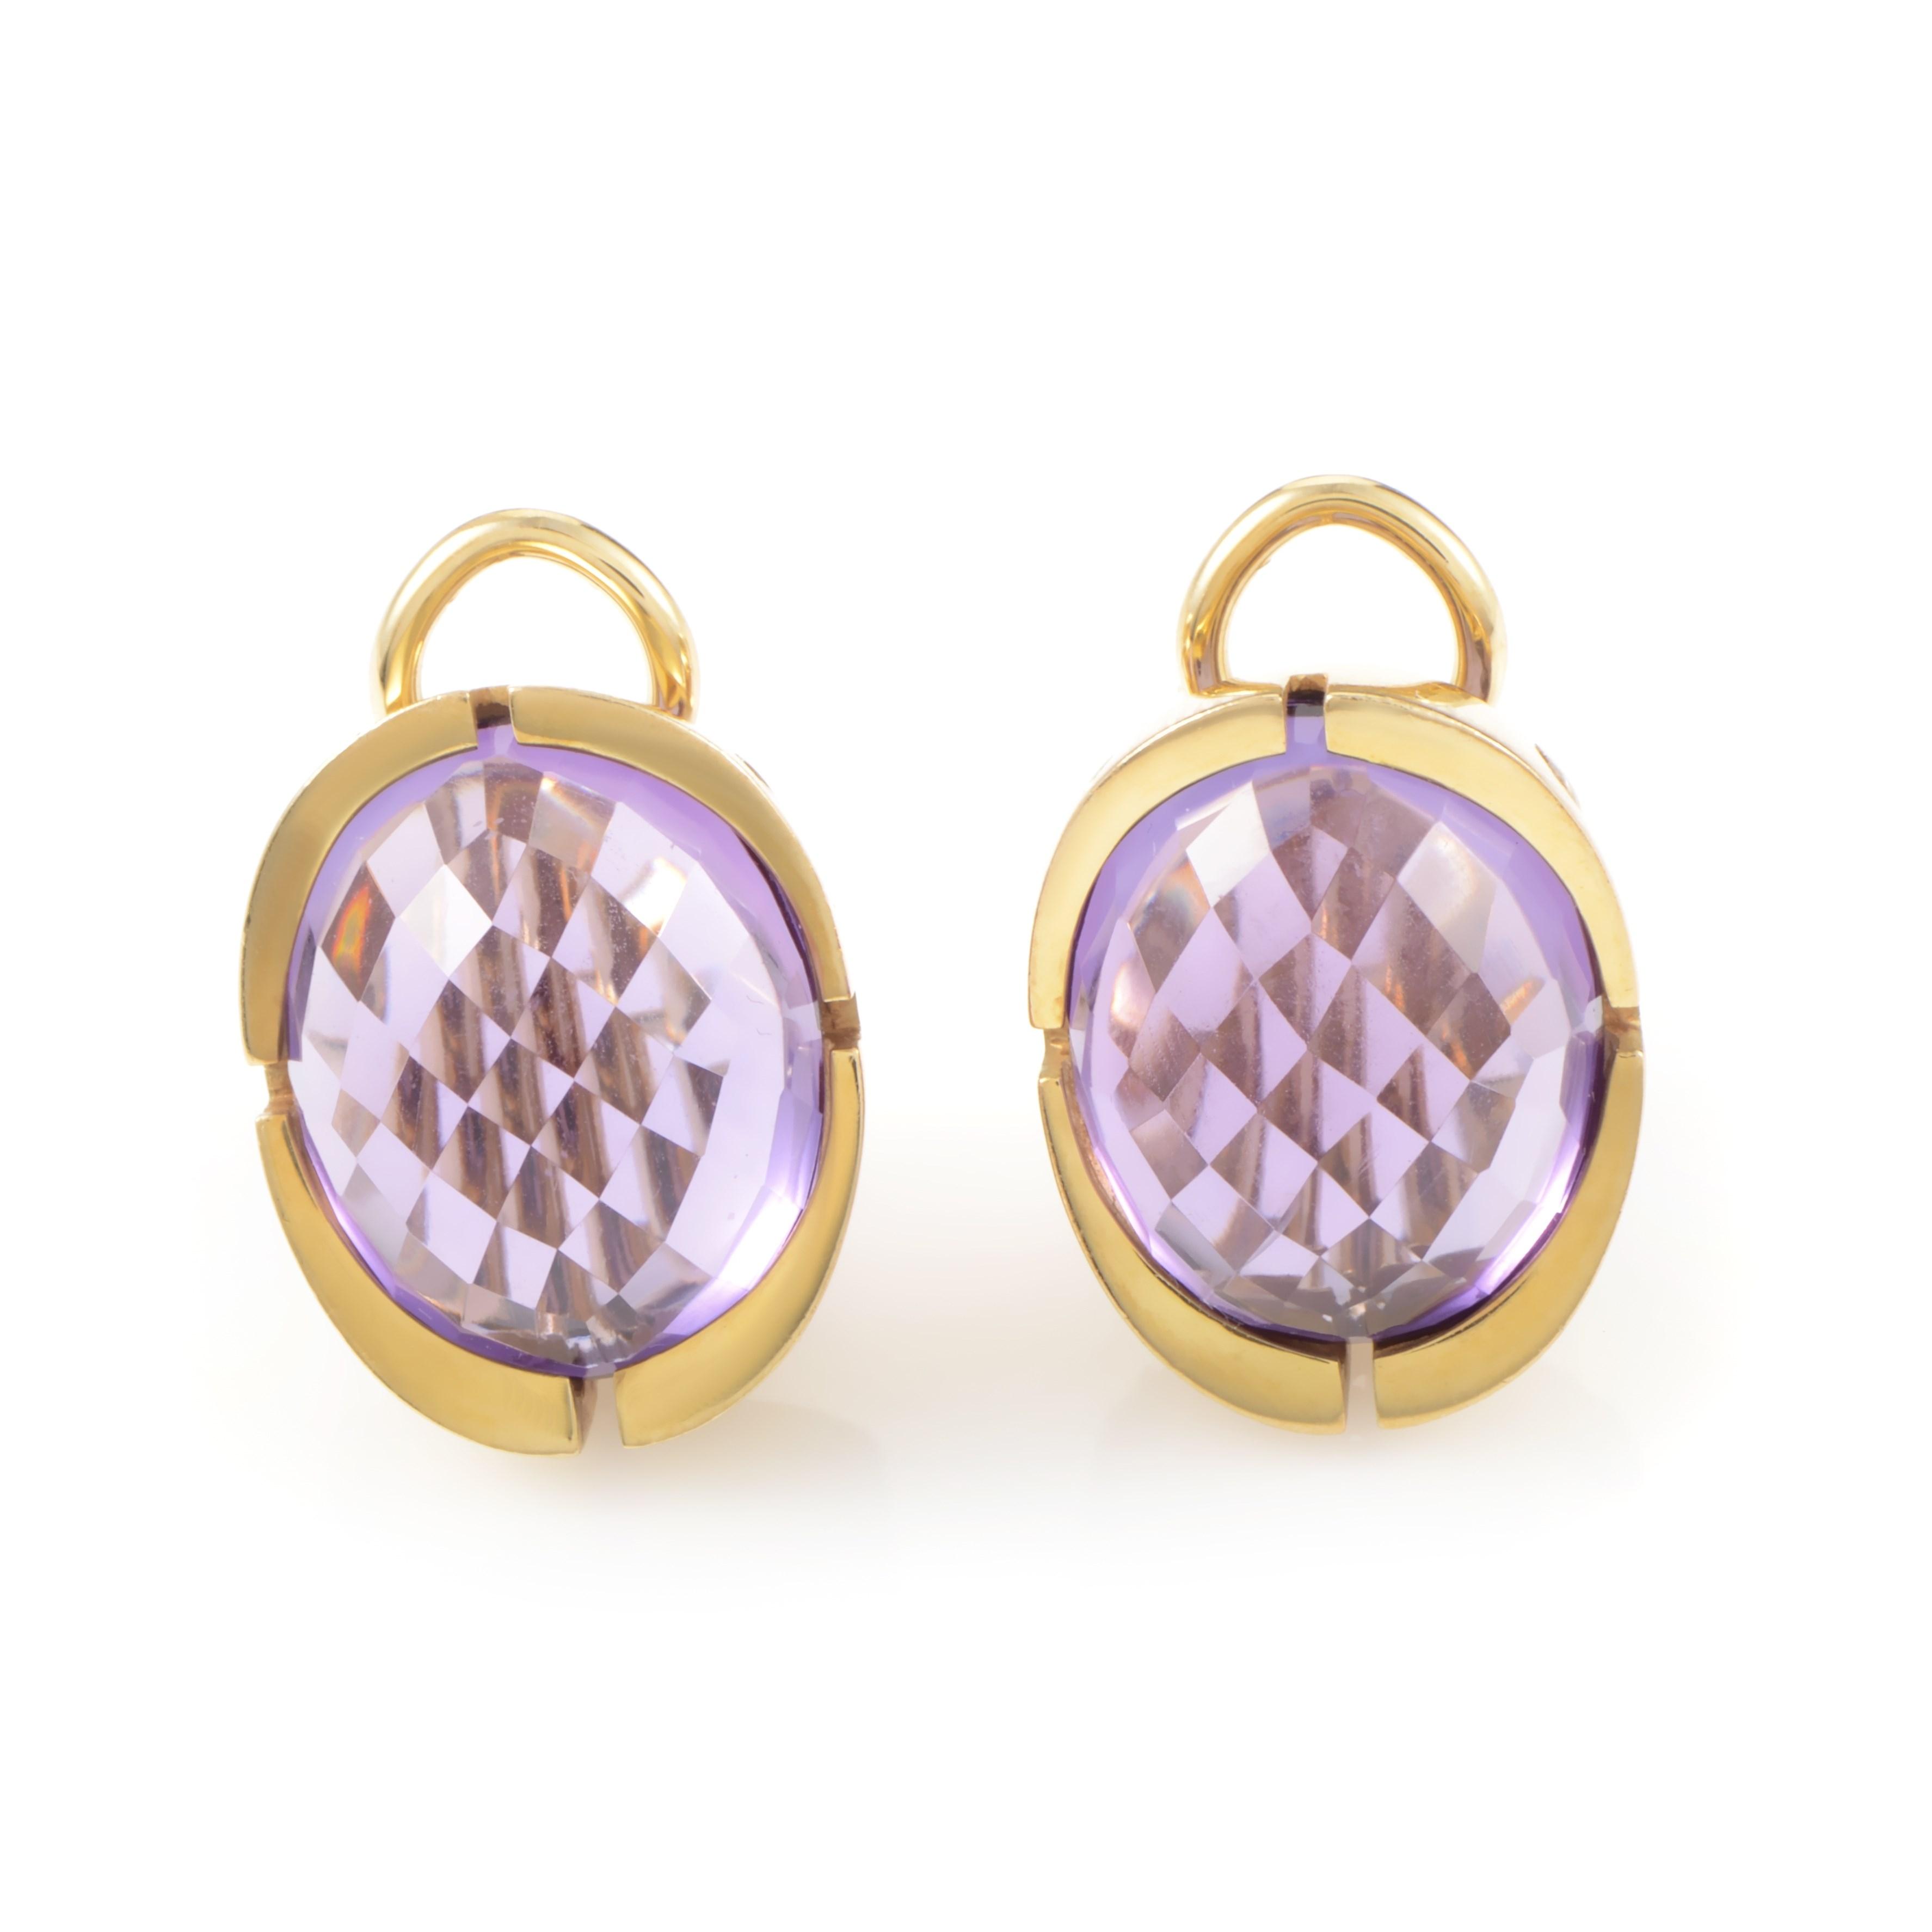 Calderoni 18K Yellow Gold Amethyst Huggie Earrings